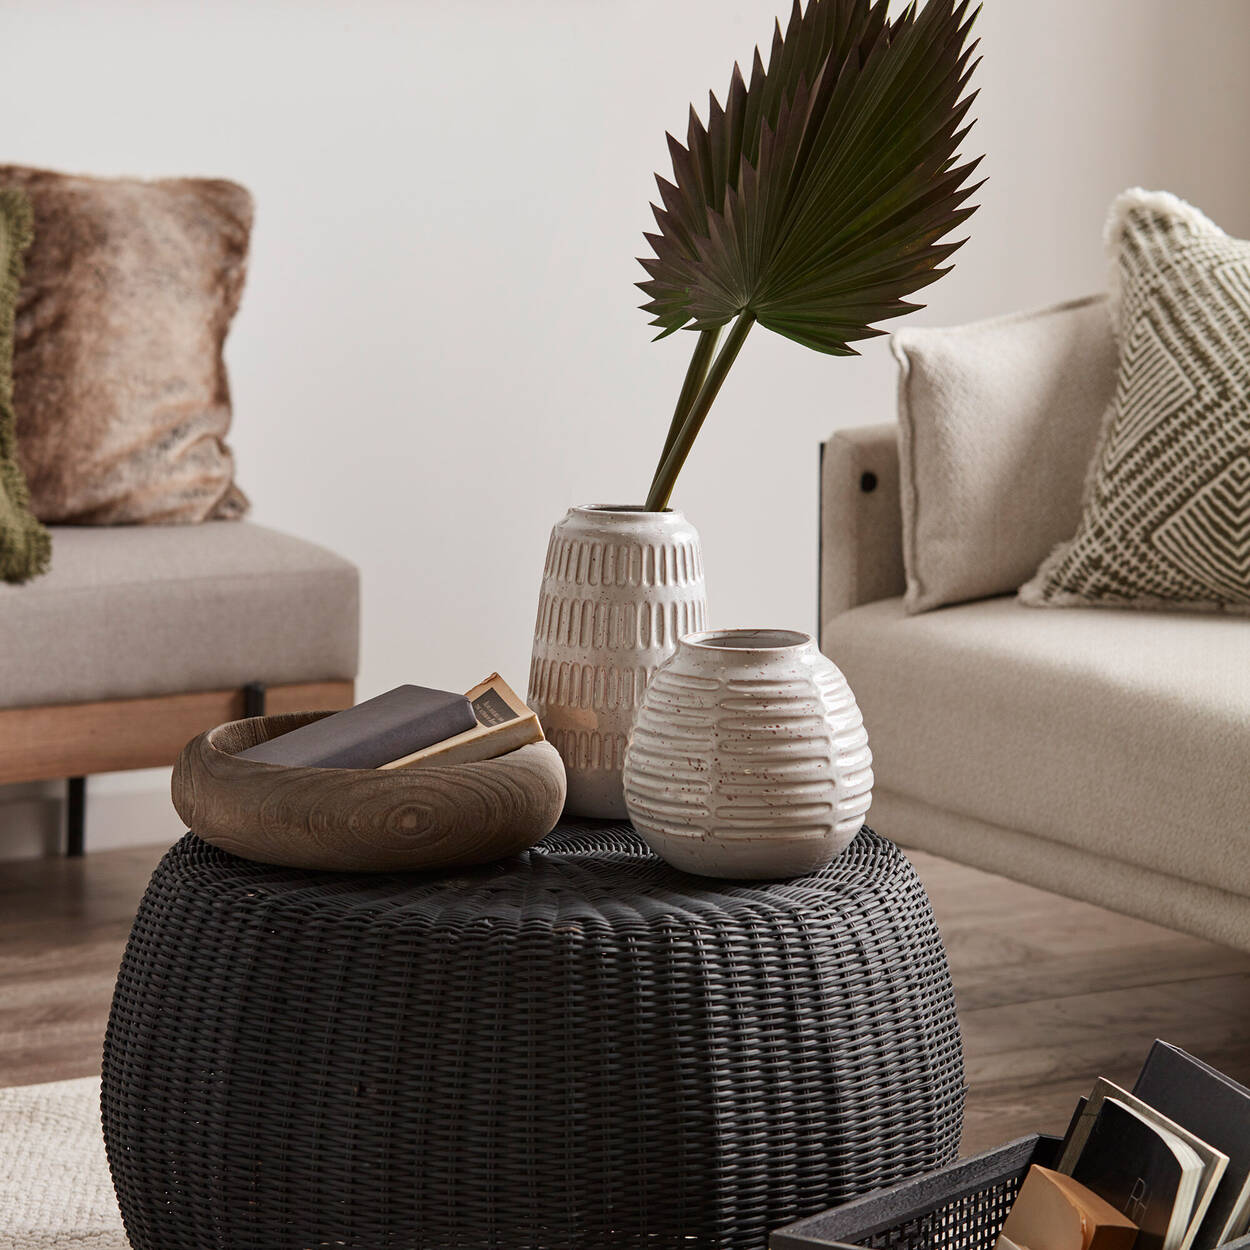 Raw Wooden Grey Bowl